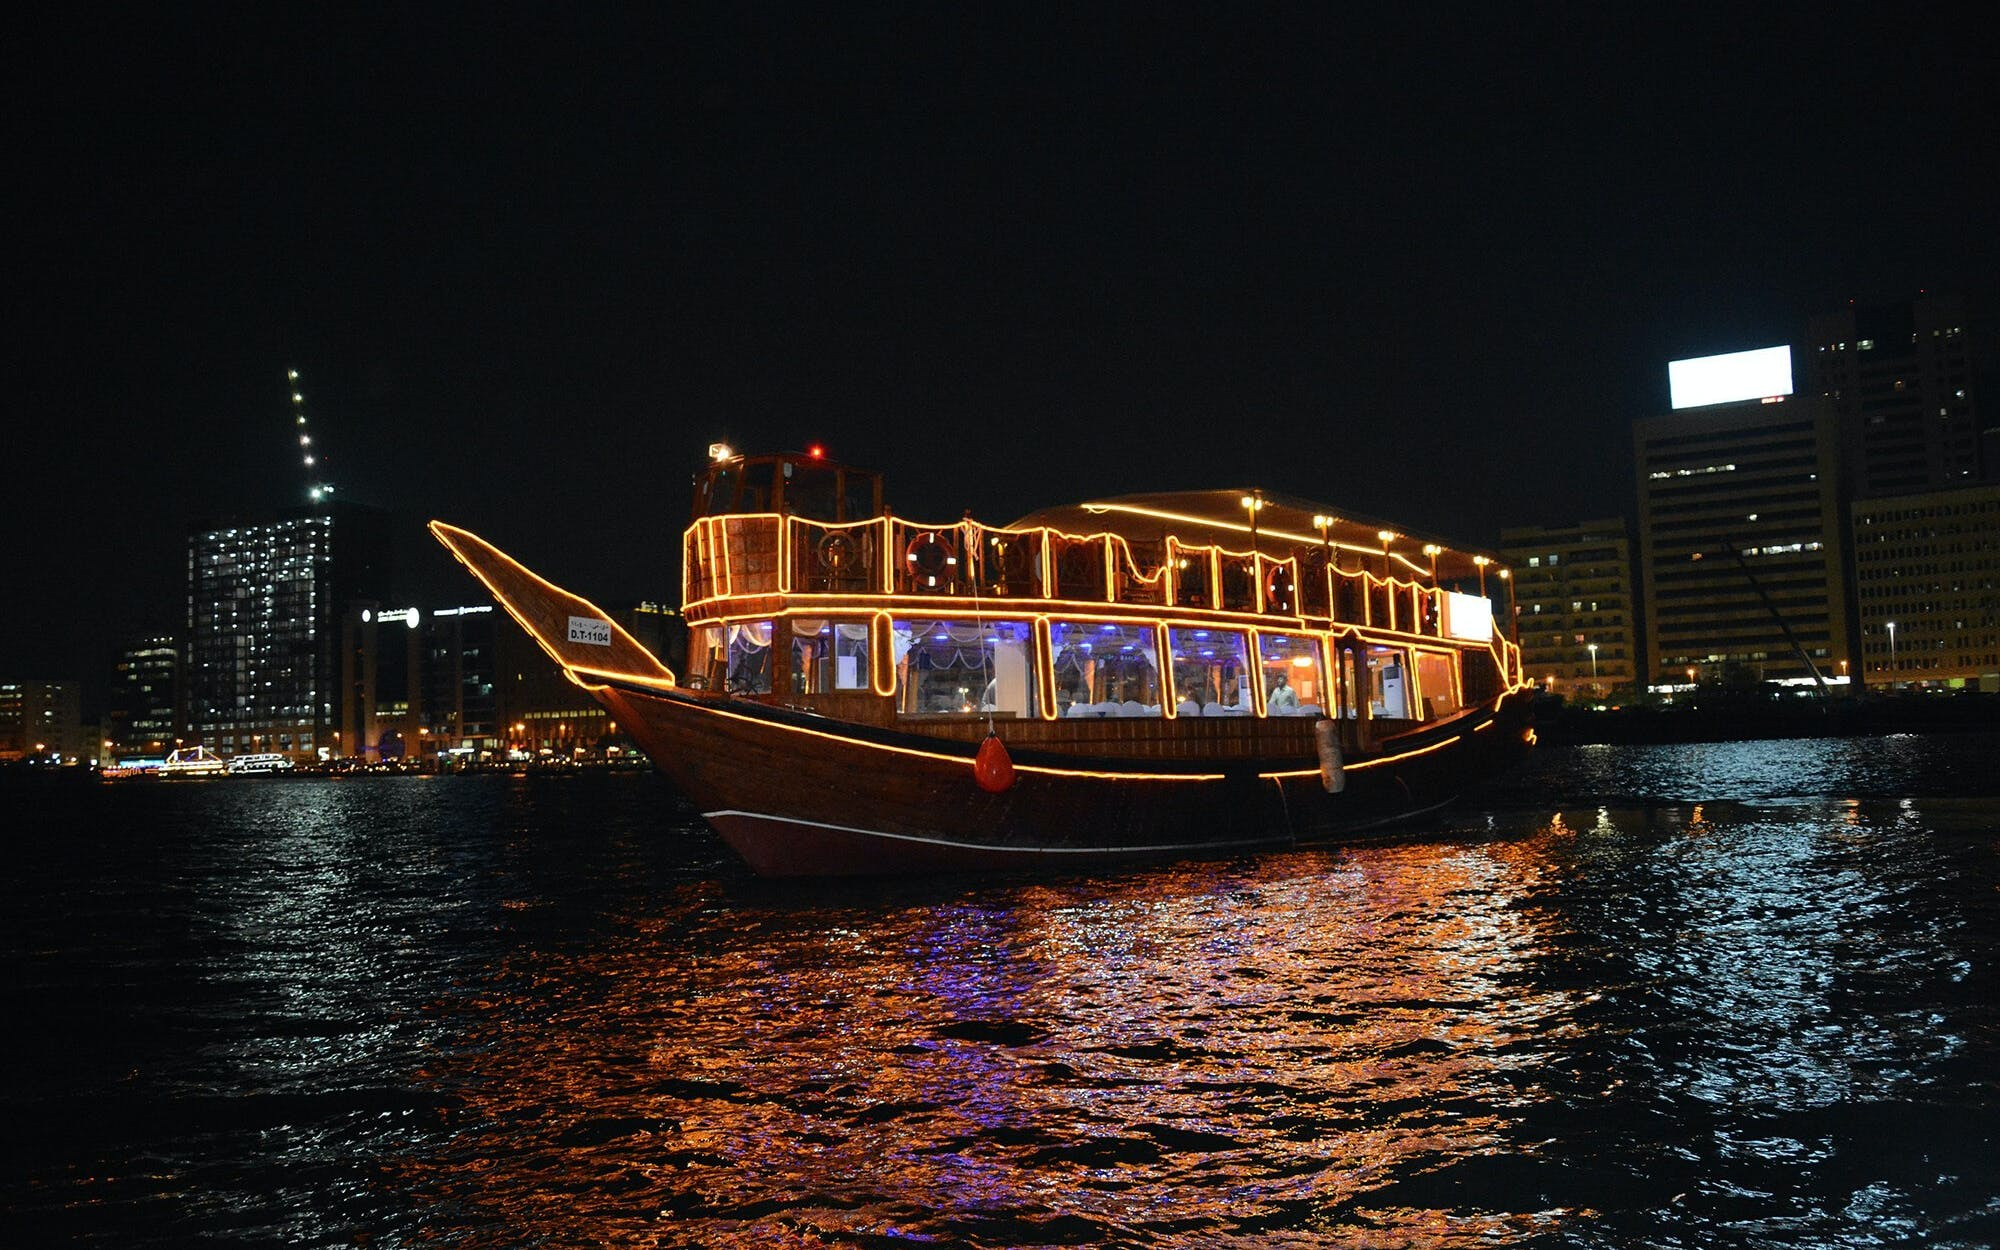 Dubai Dhow Cruise - Marina Dinner Cruise